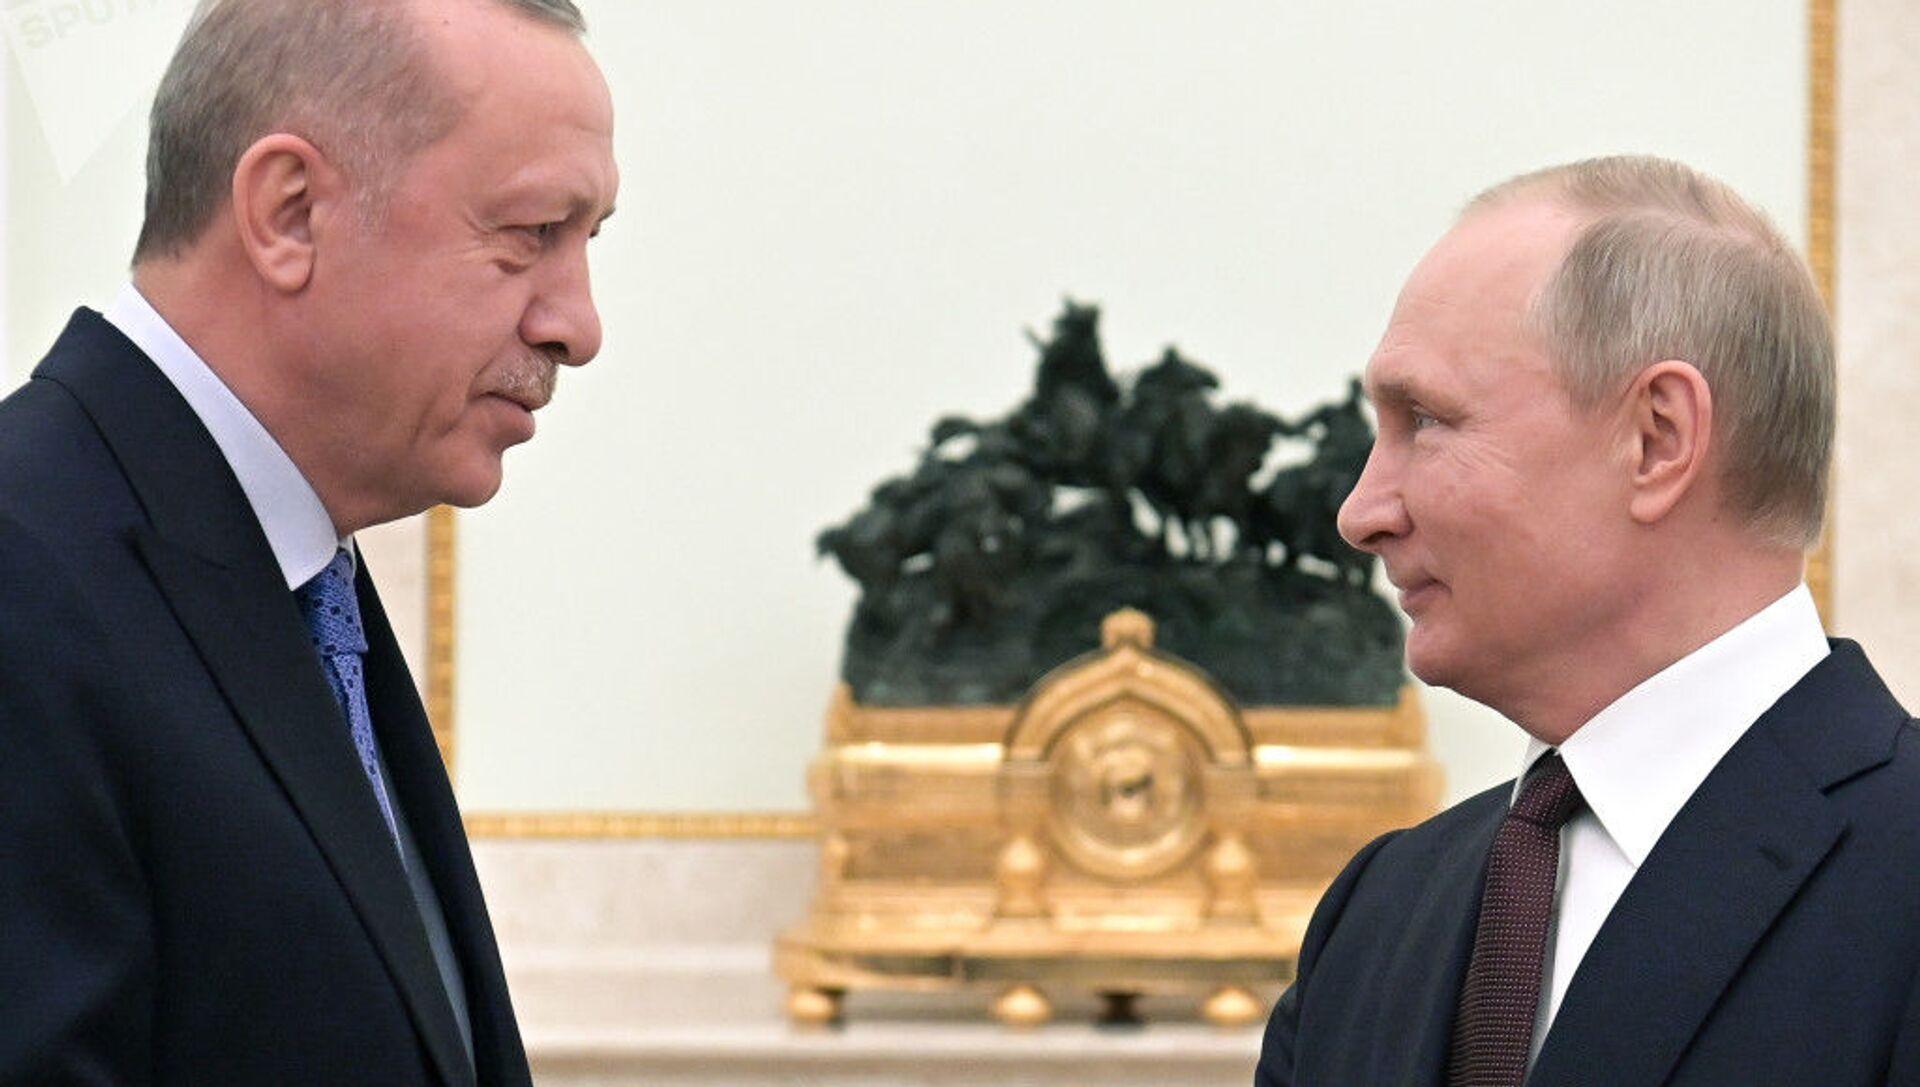 Президент РФ Владимир Путин и президент Турции Реджеп Тайип Эрдоган - Sputnik Azərbaycan, 1920, 26.09.2021